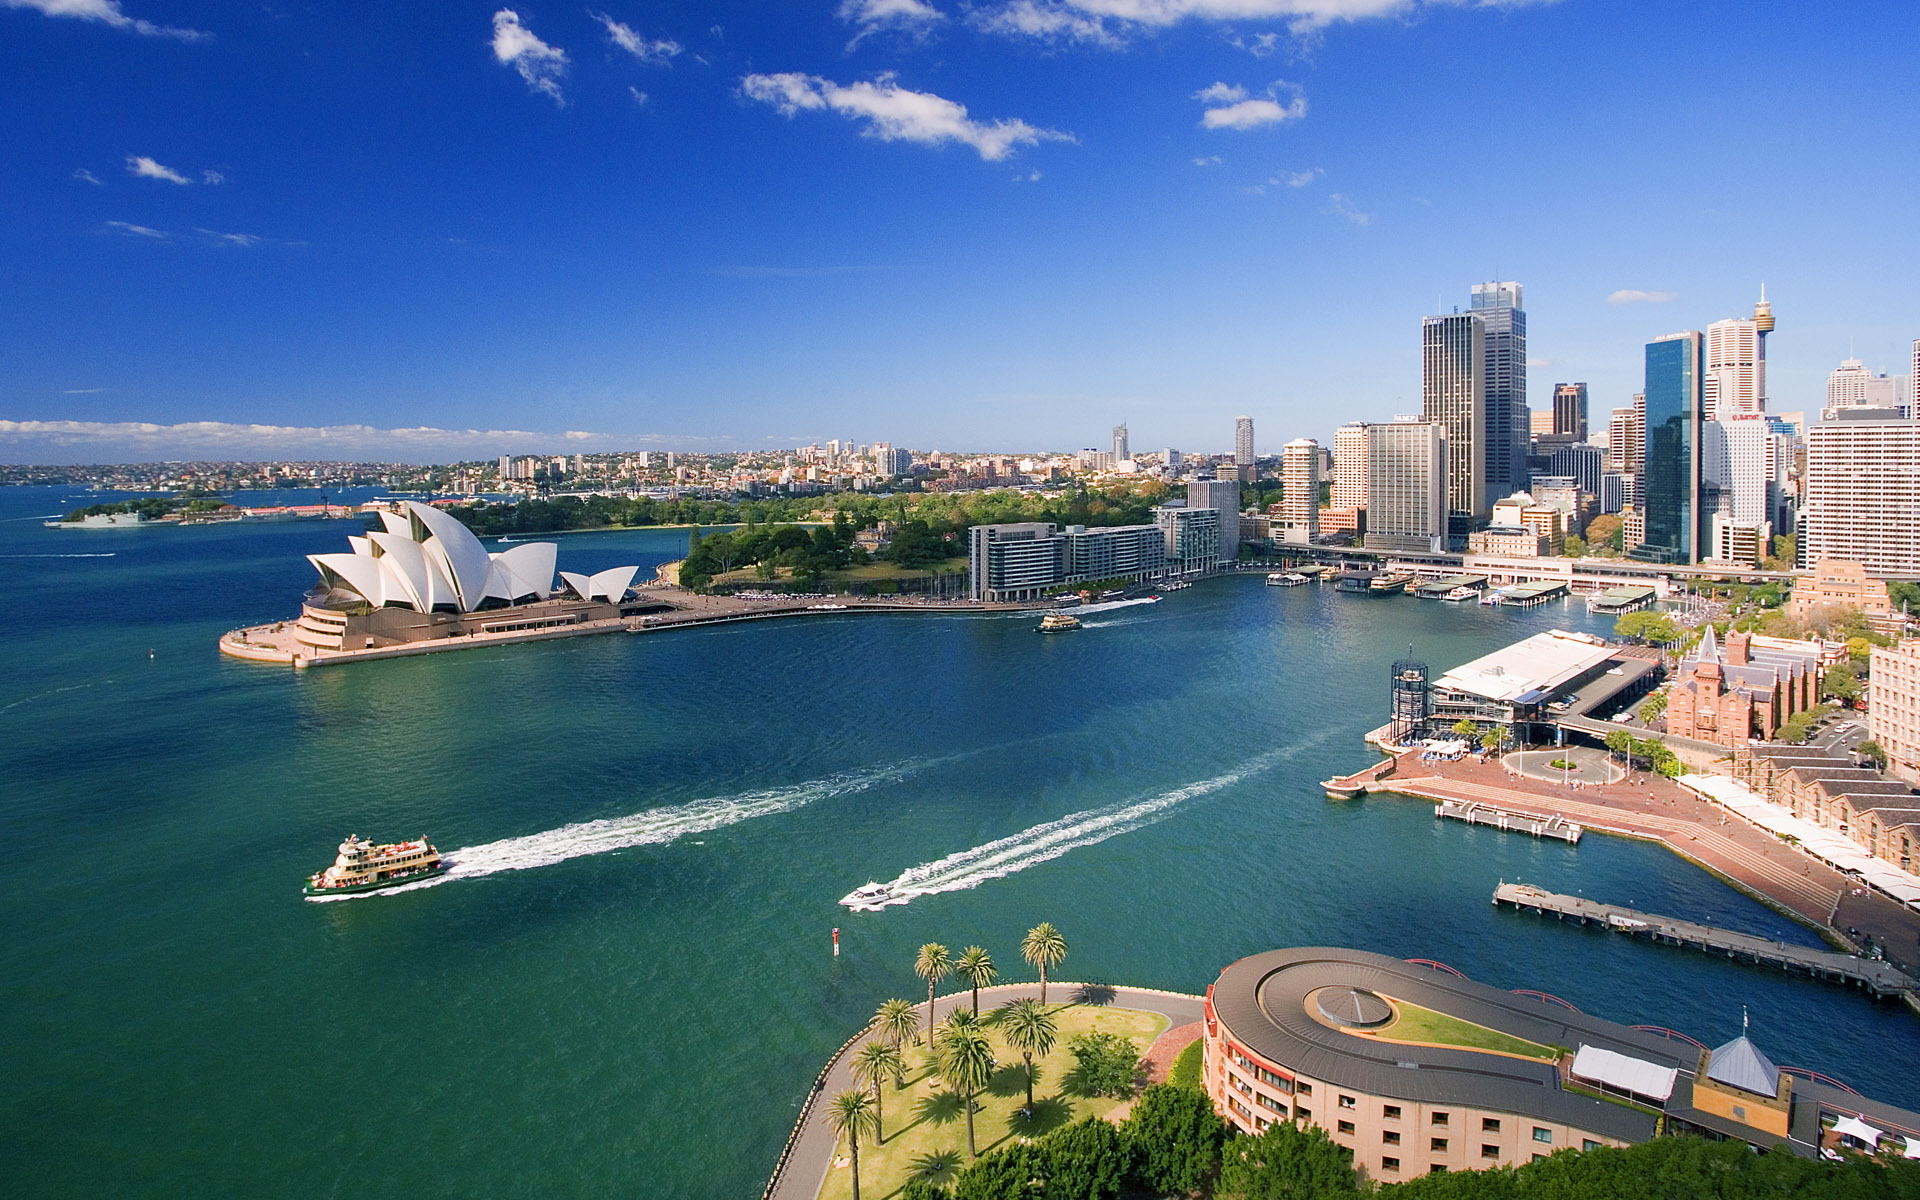 HD Australia Wallpaper